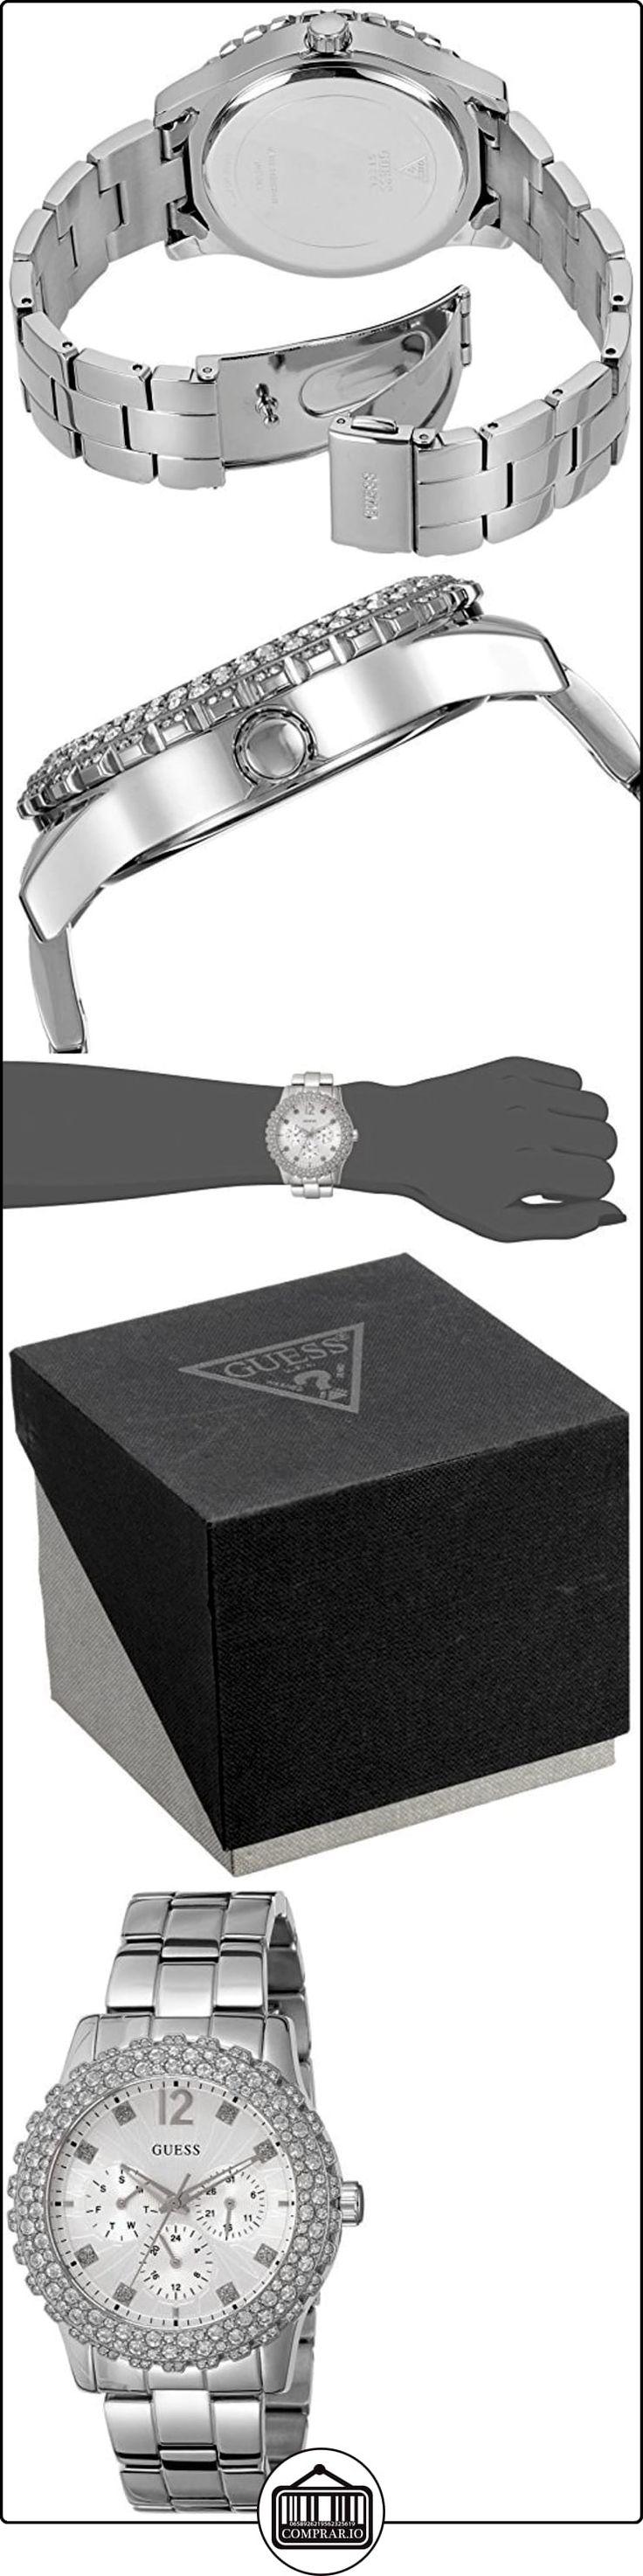 Guess W0335L1 - Reloj de pulsera mujer, acero inoxidable, color plateado  ✿ Relojes para mujer - (Gama media/alta) ✿